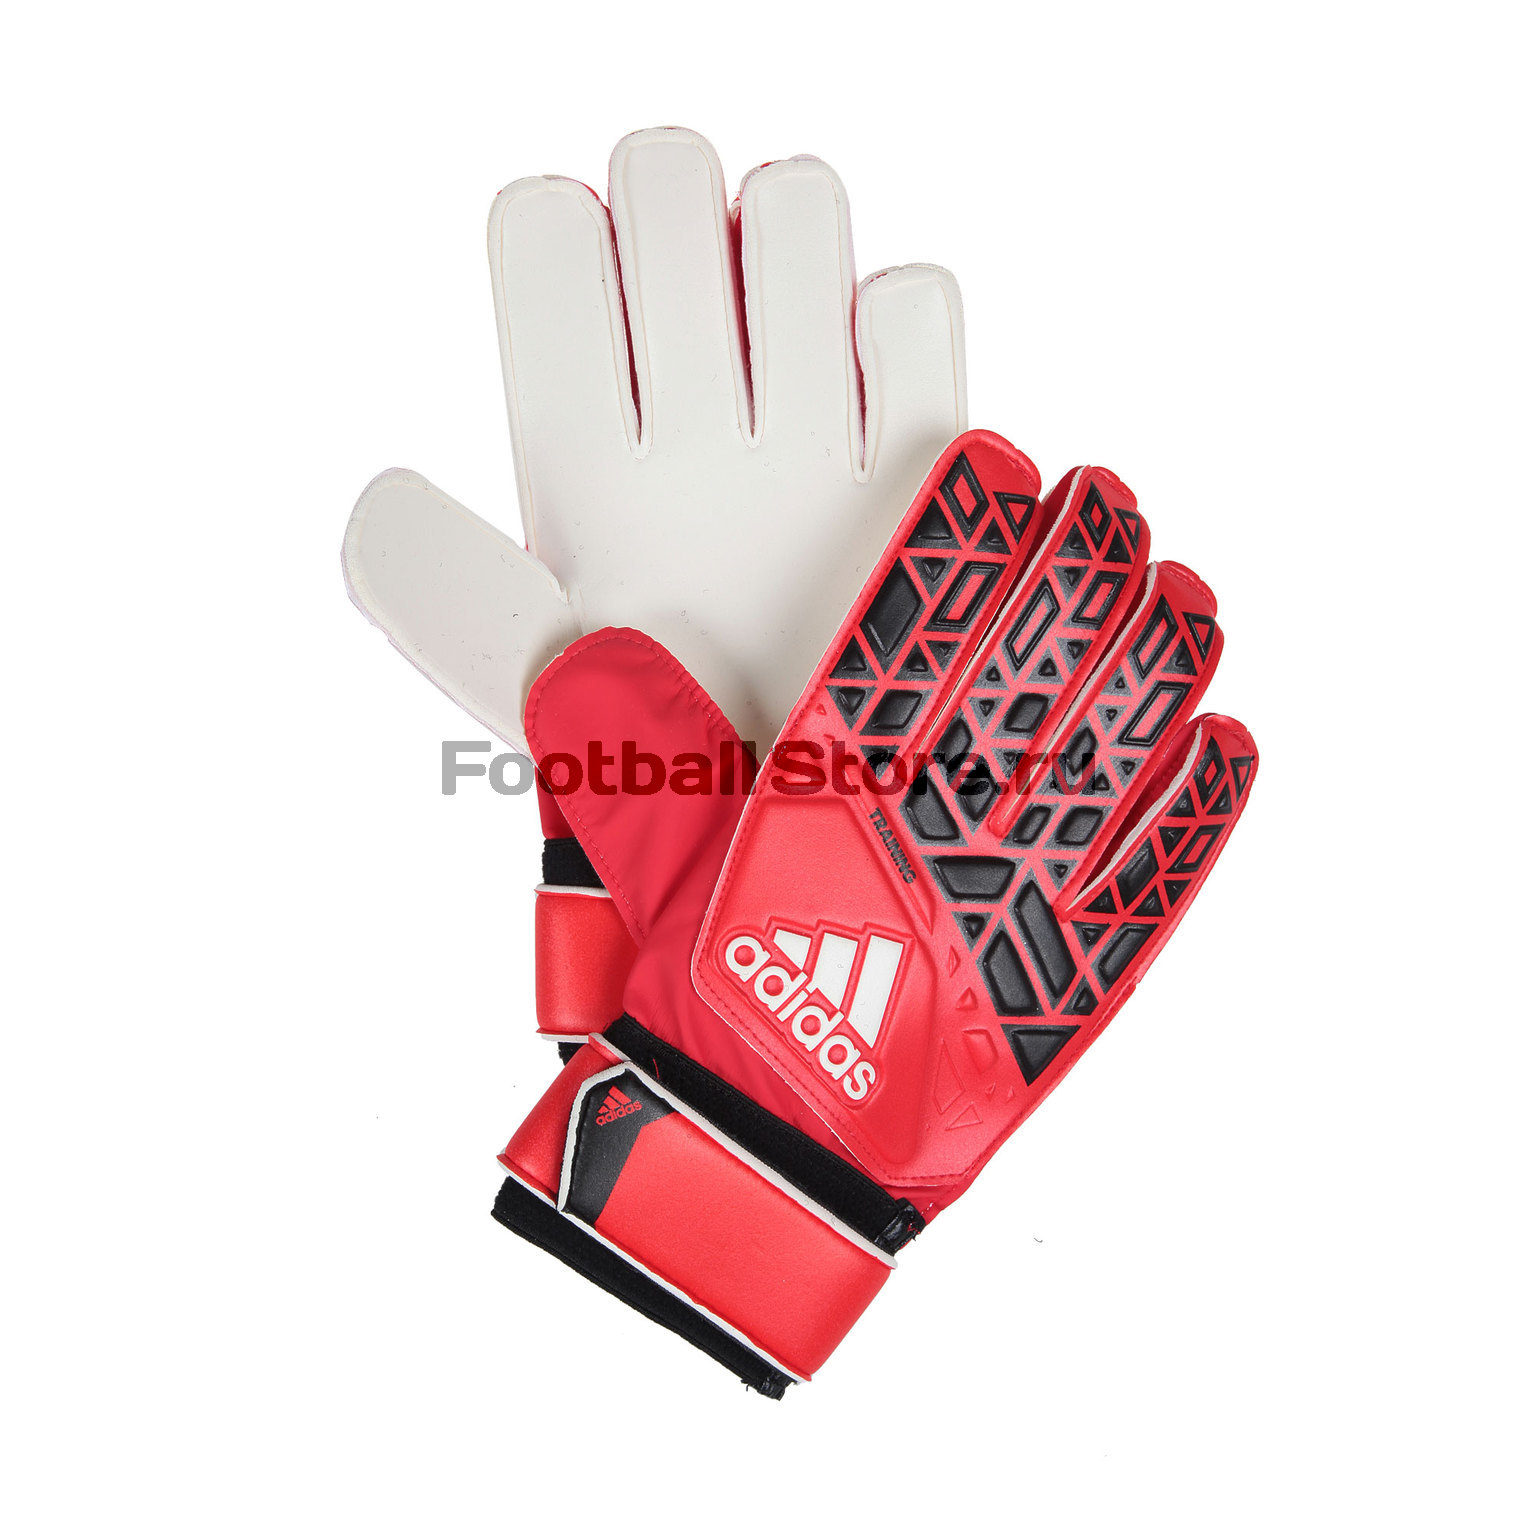 Перчатки вратарские Adidas Ace Training AZ3683 перчатки adidas перчатки adidas ace zones ultim ah7802